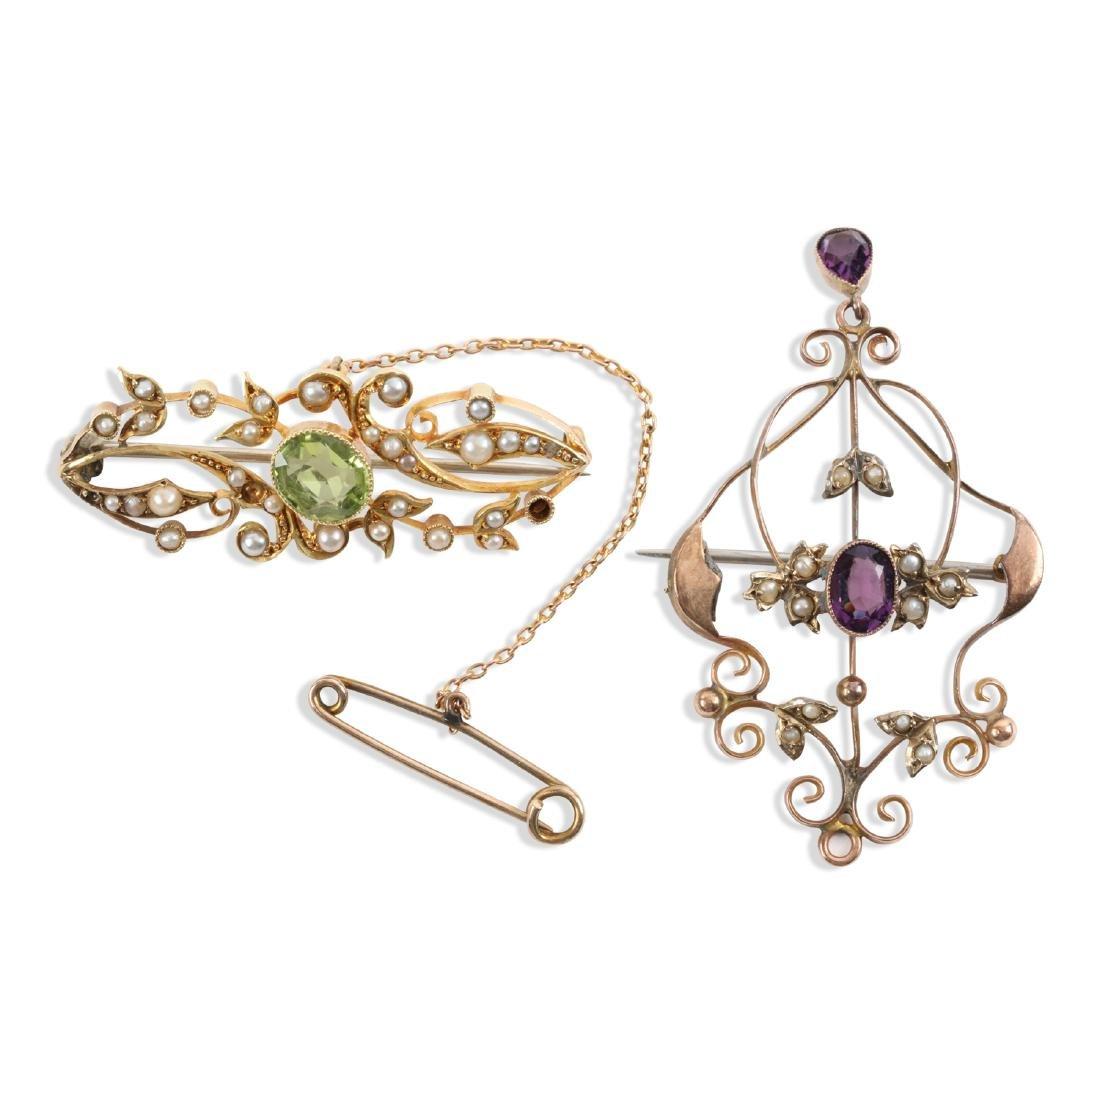 A Pair, Edwardian 15K, Amethyst & Seed Pearl Pendants